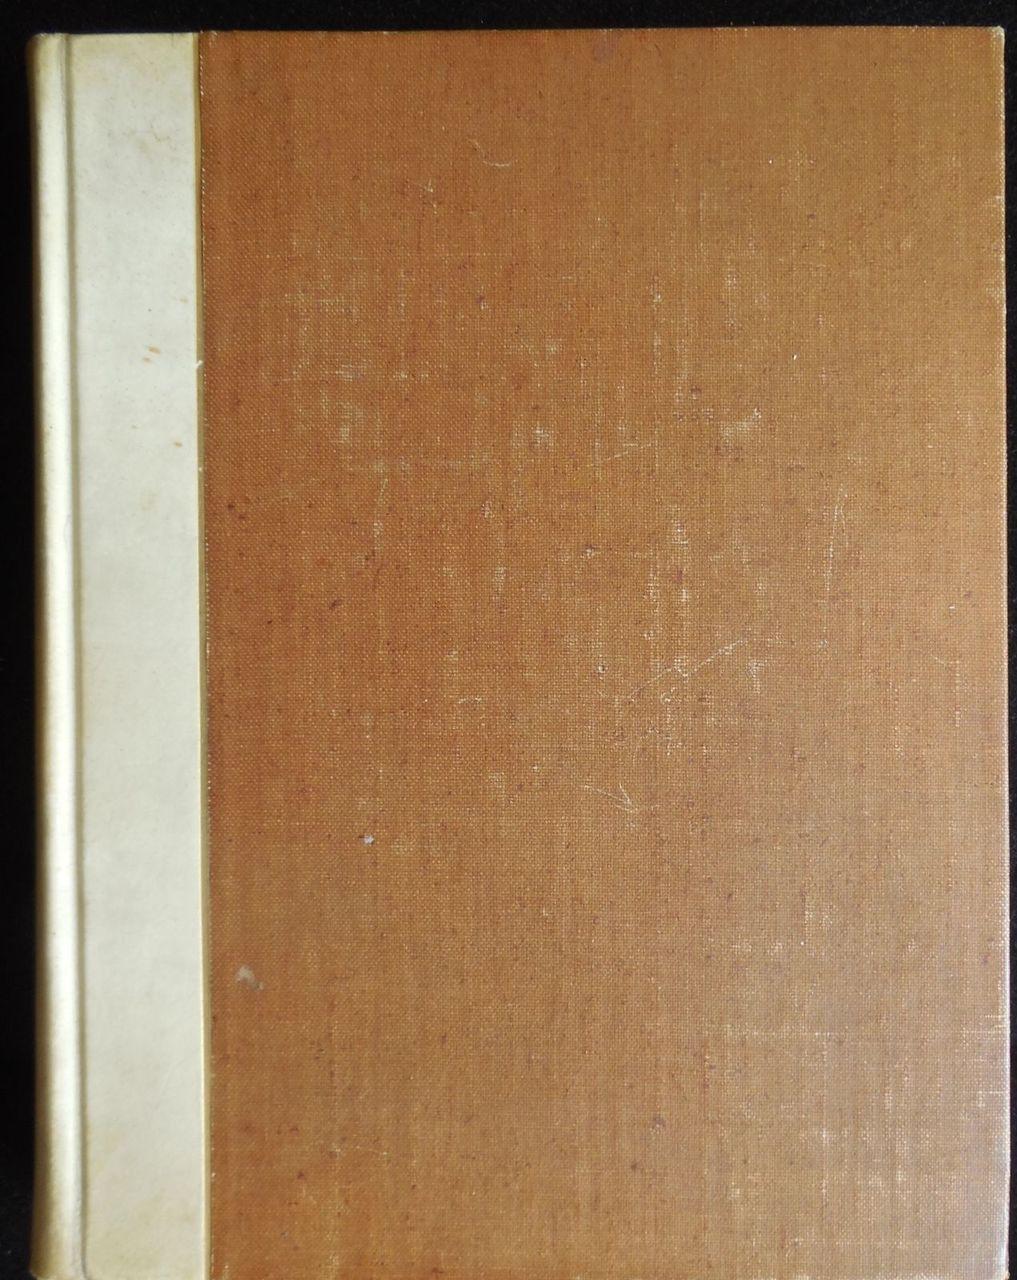 THE GUN ROOM GUIDE, by Hugh B.C. Pollard - 1930 [Signed Ltd Ed]